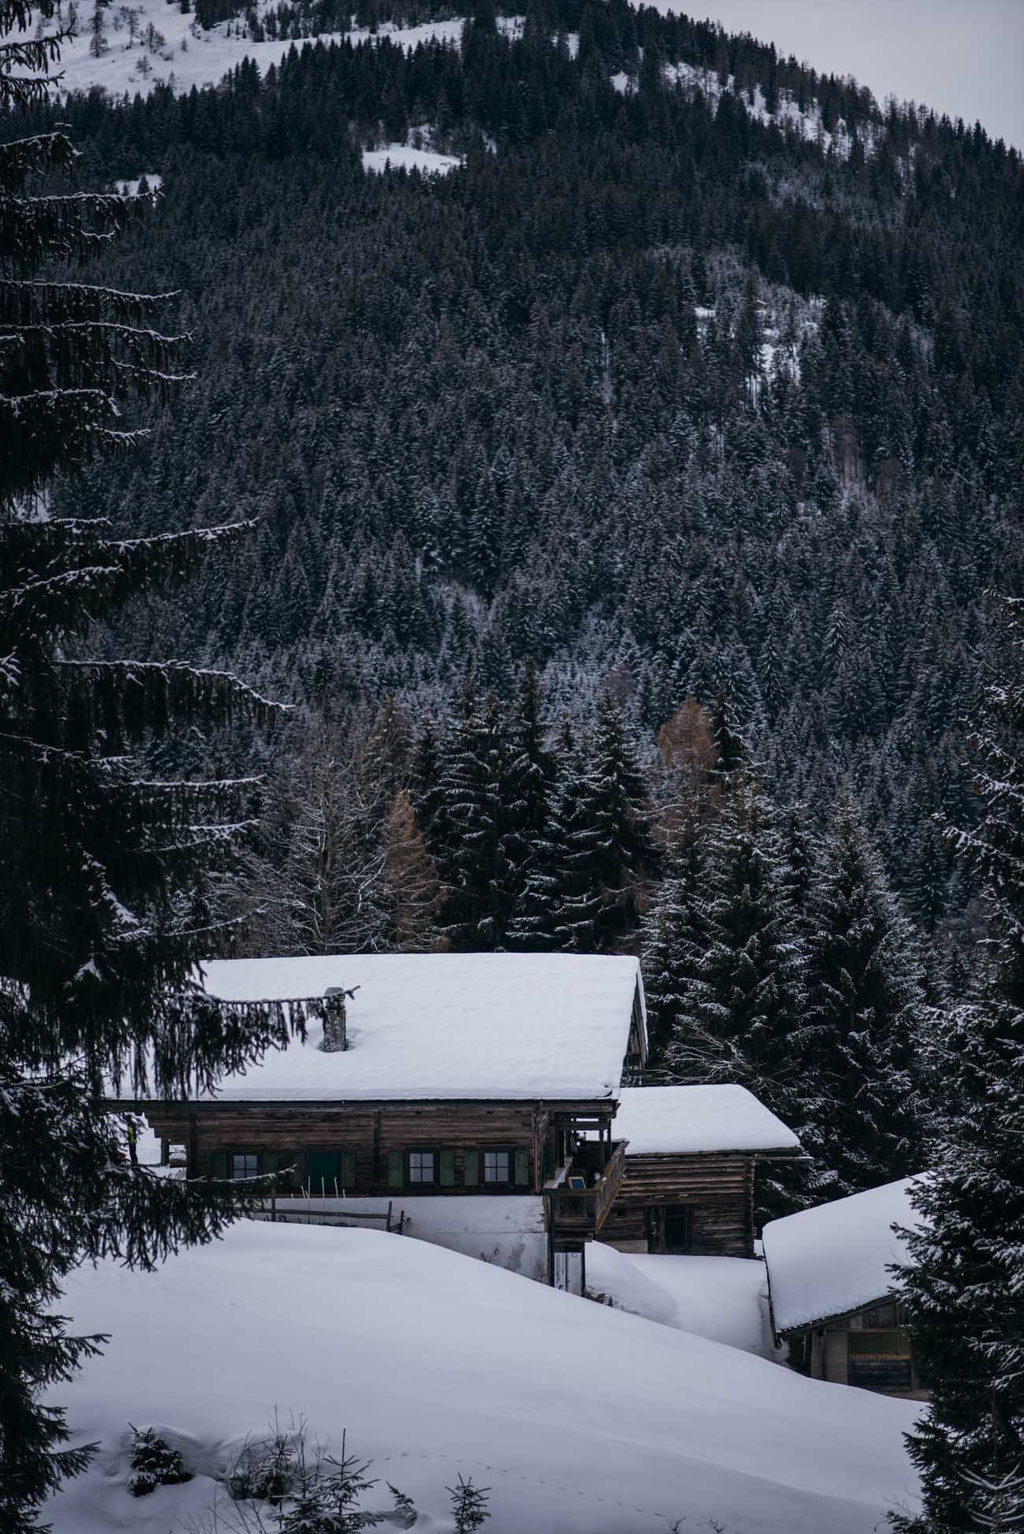 Rodelbahn Haagalm, Hopfgarten, Brixental - Kitzbüheler Alpen